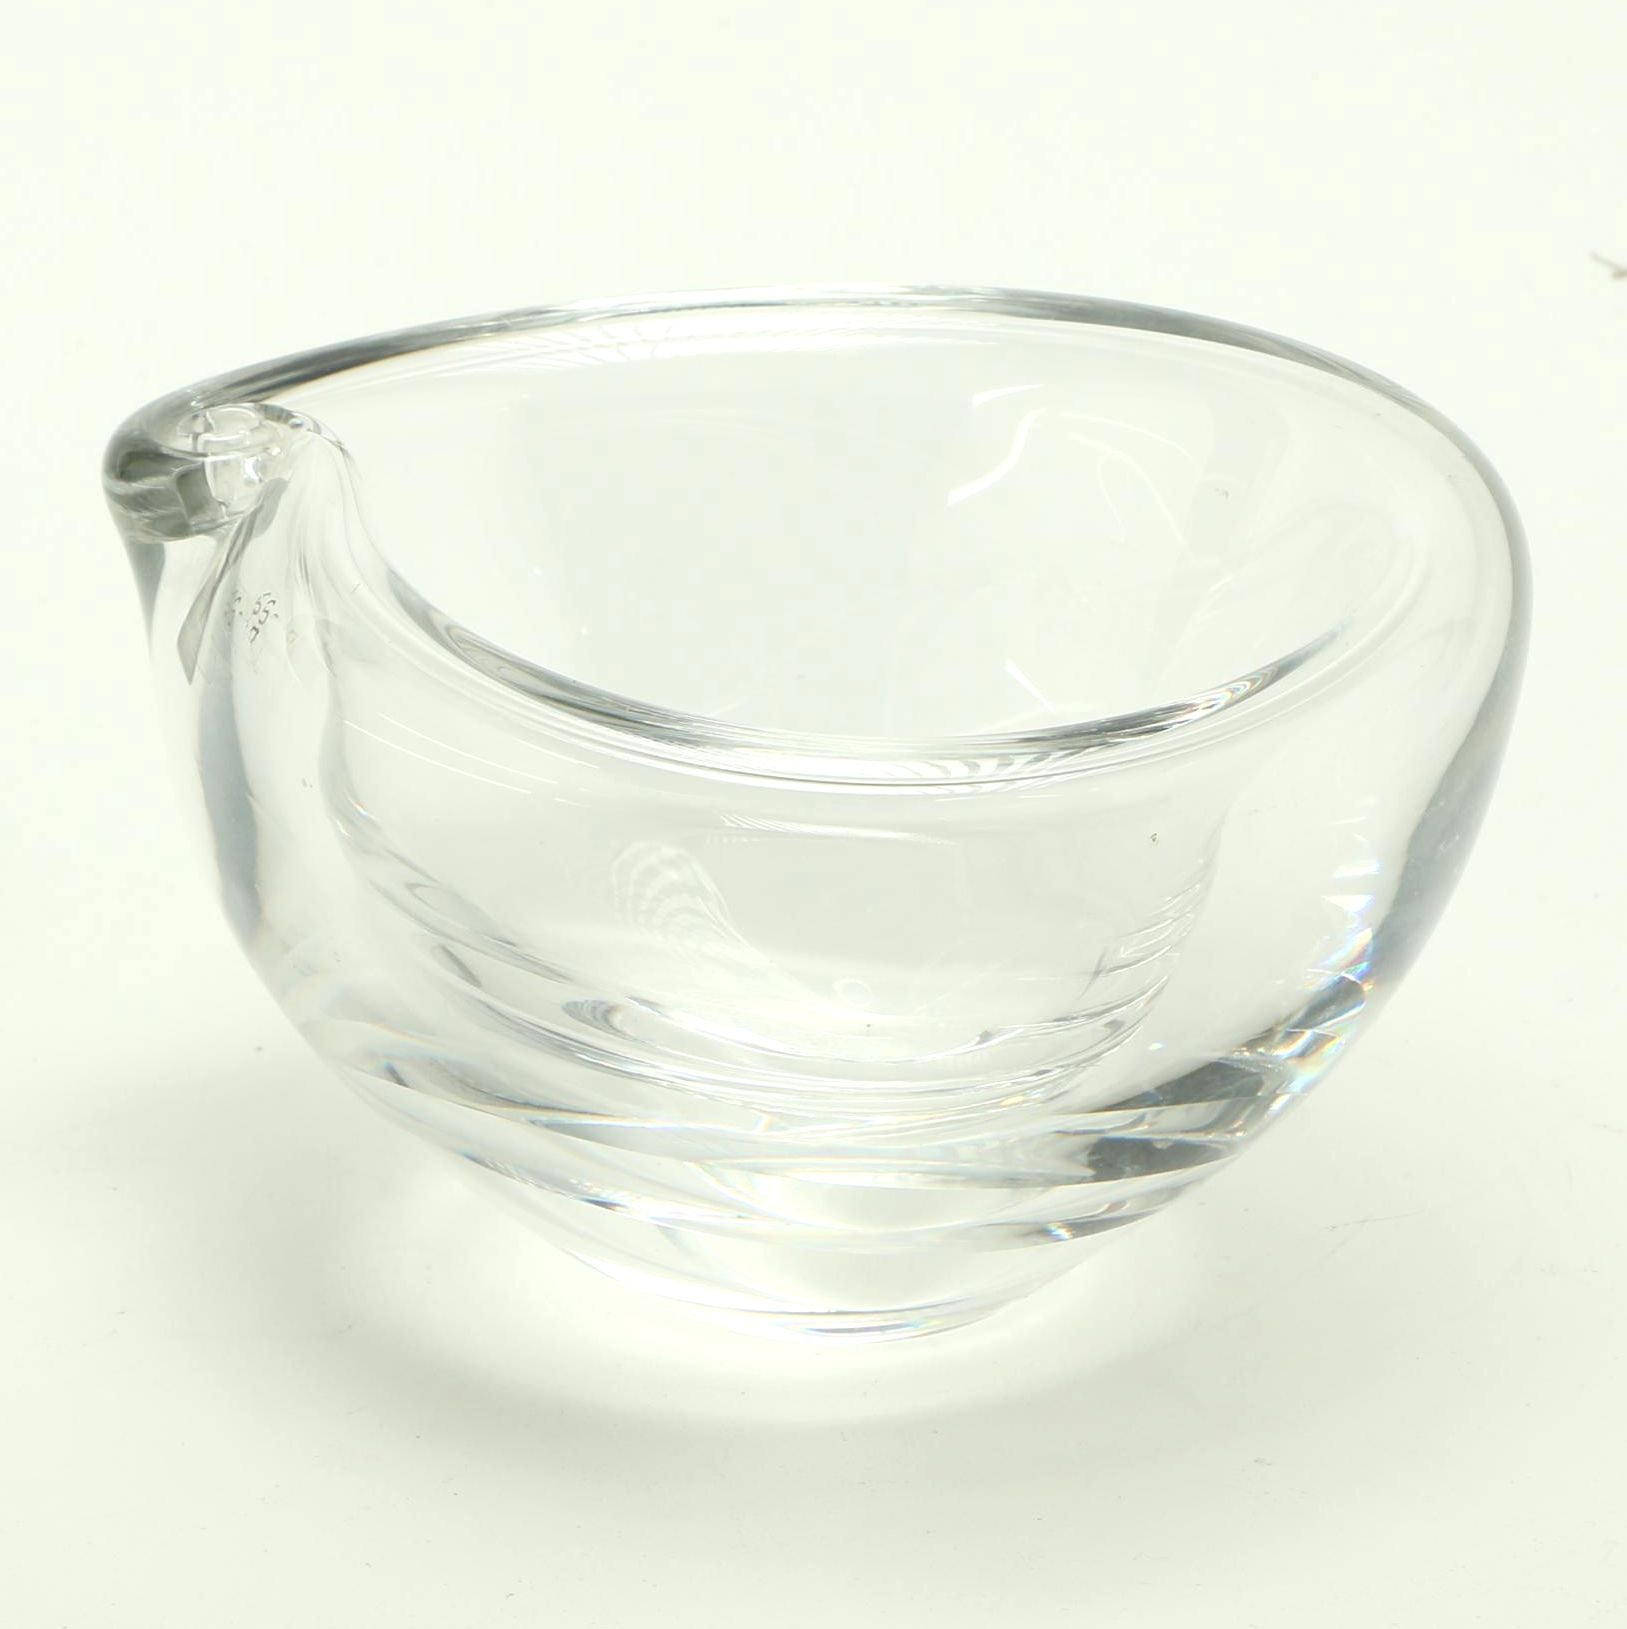 Handmade Mats Johansson Crystal Bowl